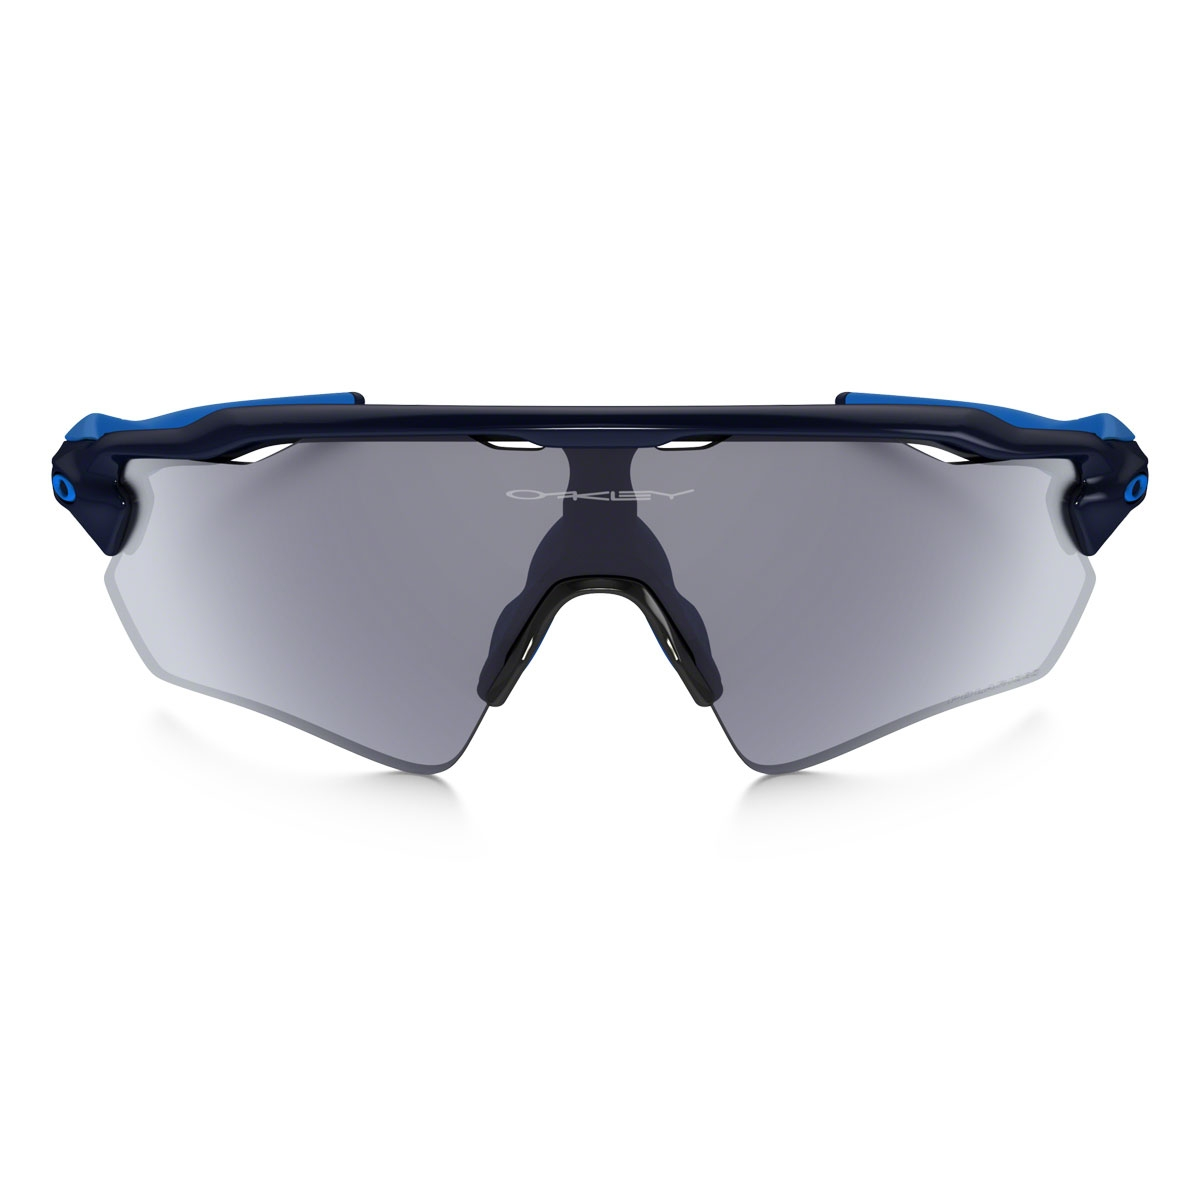 486b981fb6 ... Image of Oakley Radar EV Path Men s Polarized Sunglasses - Navy   Grey  Polarized